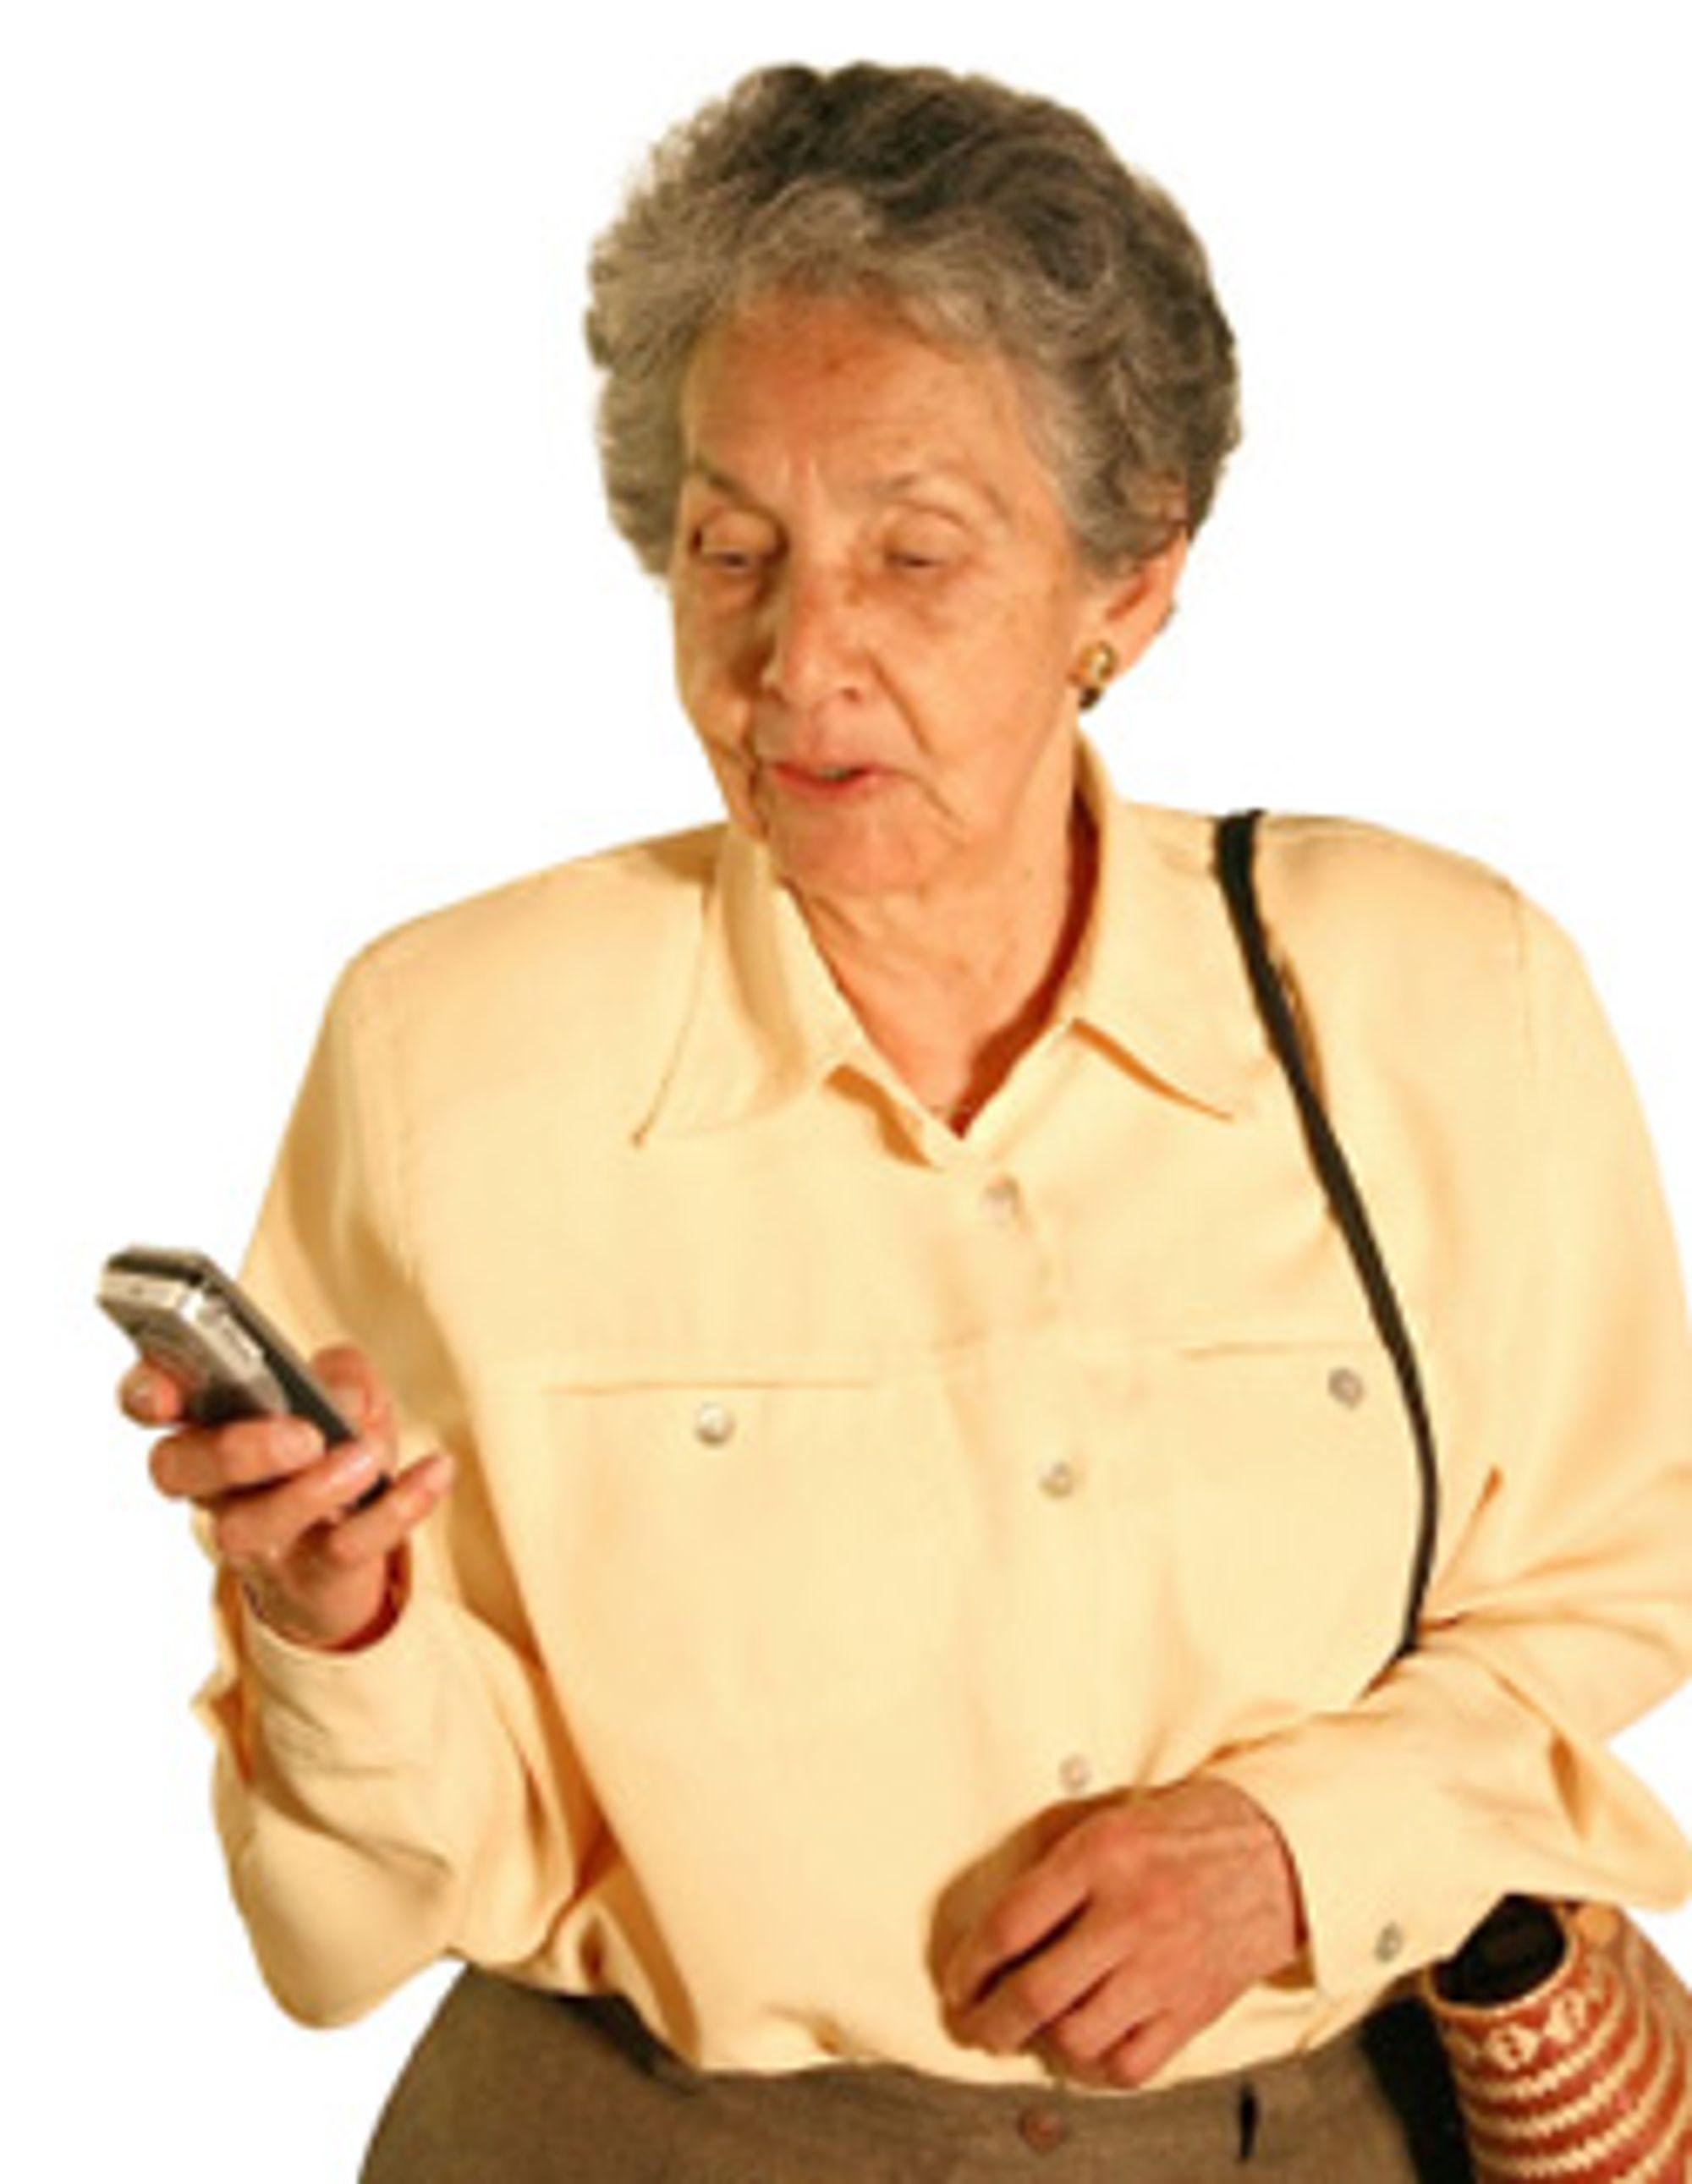 Send besteforeldrene dine en jule-SMS, oppfordrer NetCom. (Foto: Istockphoto / Andersr)